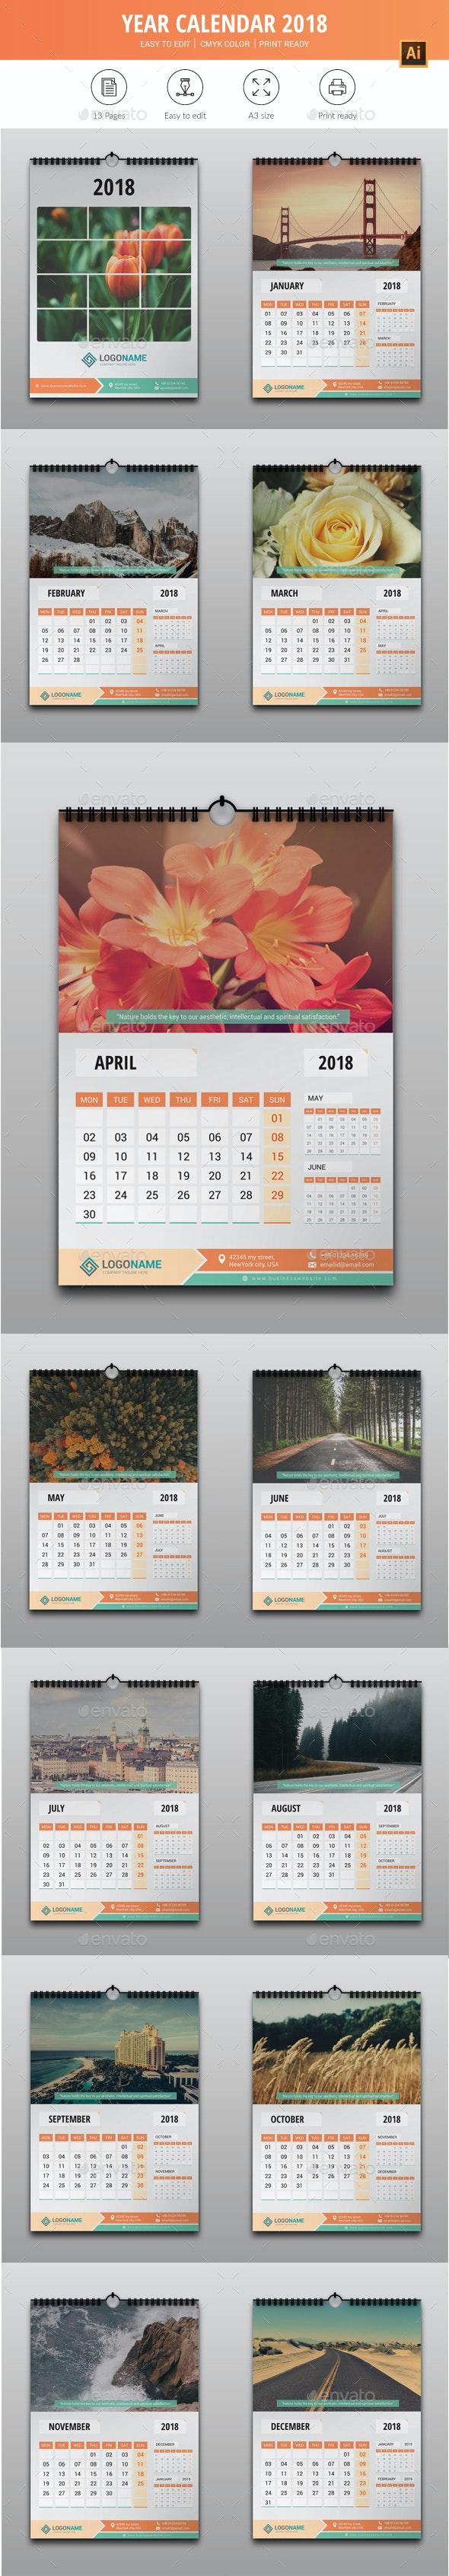 Year Calendar 2018 - Calendars Stationery